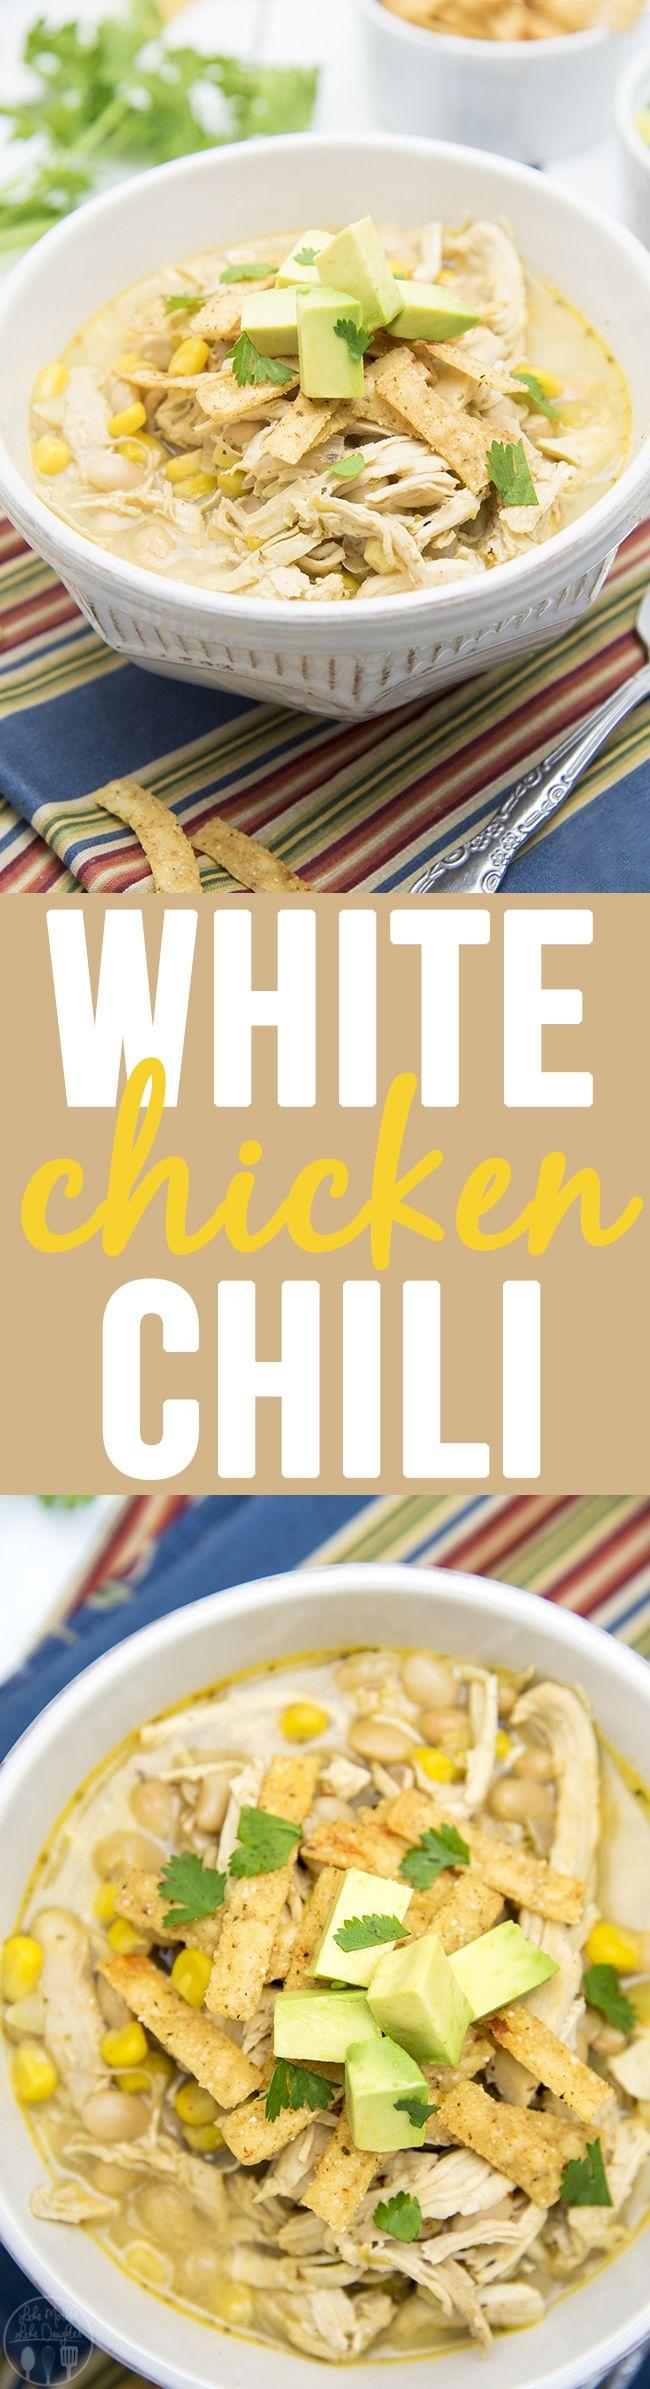 61eeaacab54945e4e5aa16cdb73adf44  chicken corn soup rotisserie chicken chili - Better Homes And Gardens White Chicken Chili Recipe